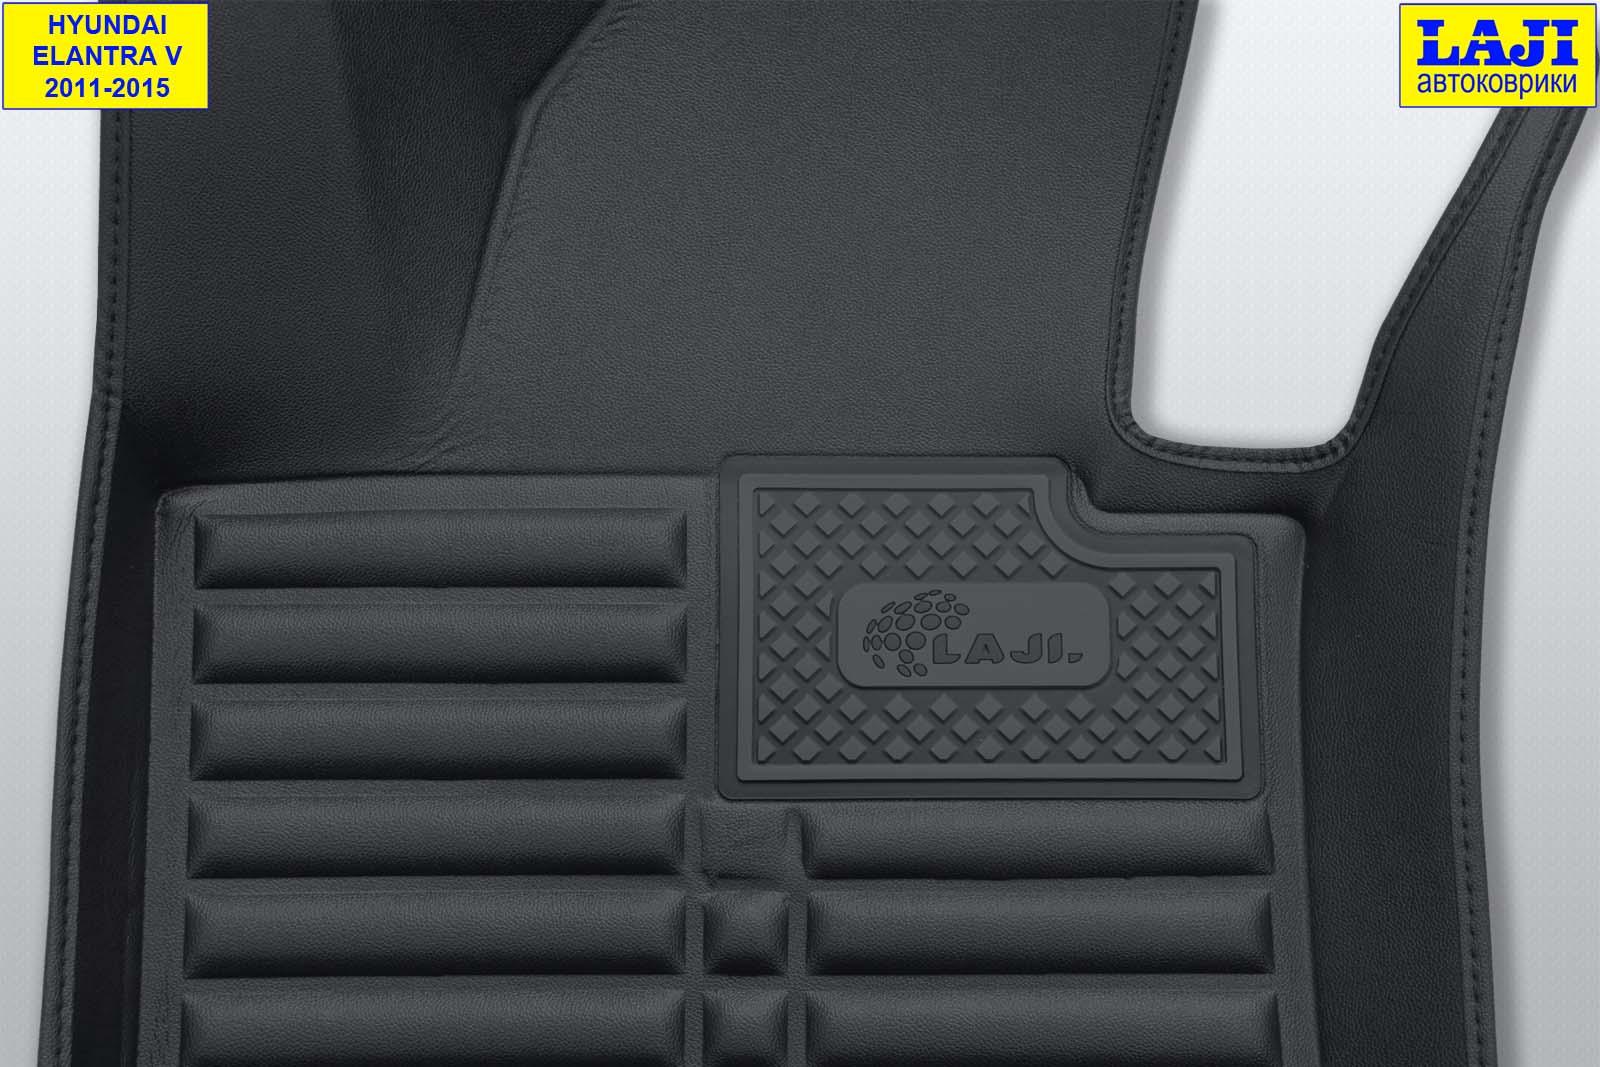 5D коврики в салон Hyundai Elantra 5 2011-2015 6